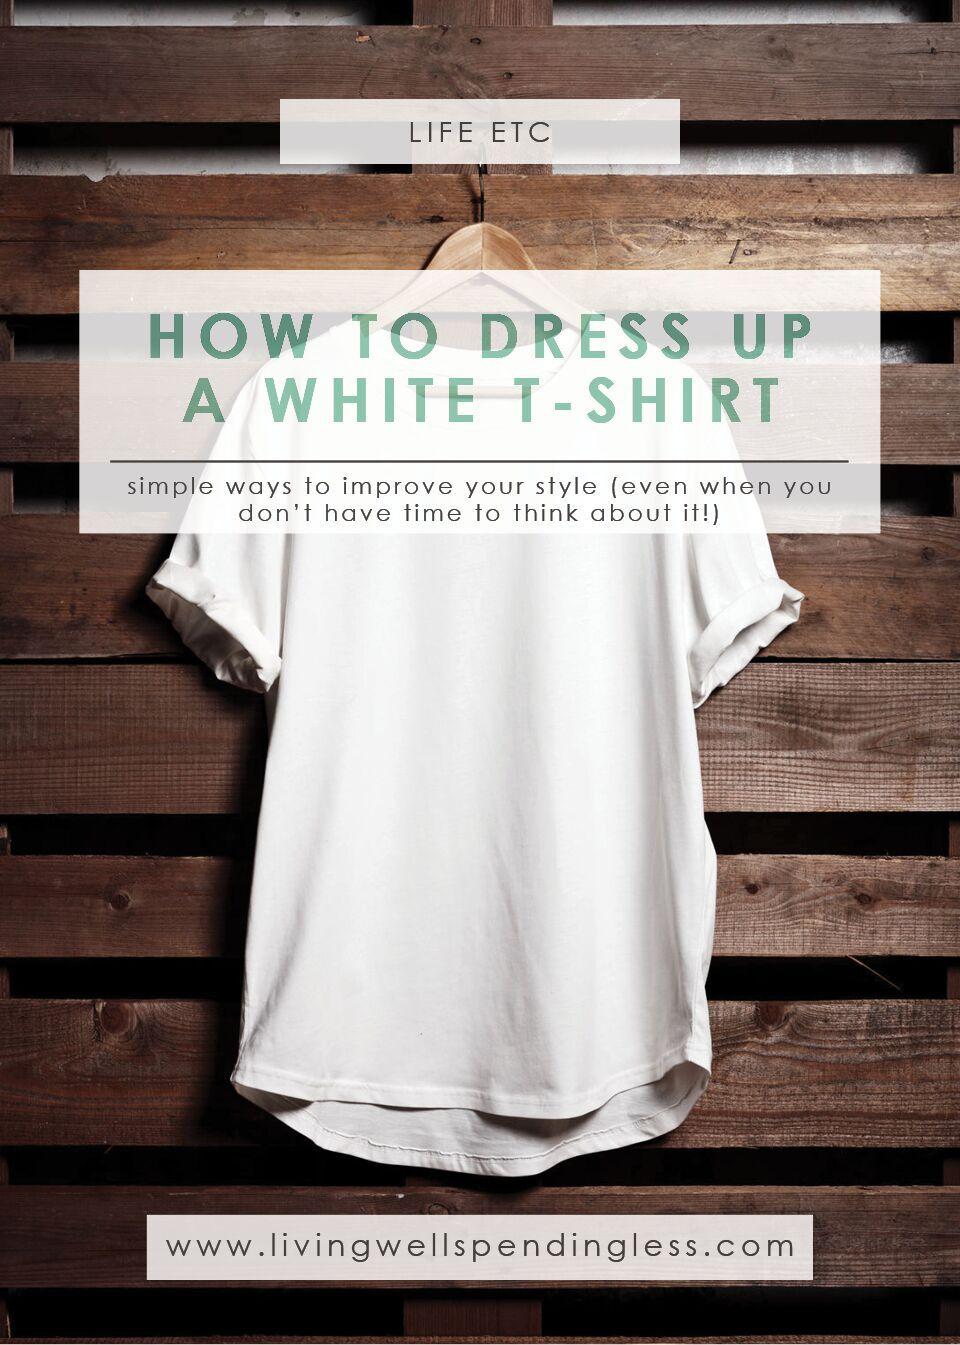 Dress Up a White T-Shirt   Fashion & Beauty   White T-Shirt Outfit Ideas   White T-Shirt Style